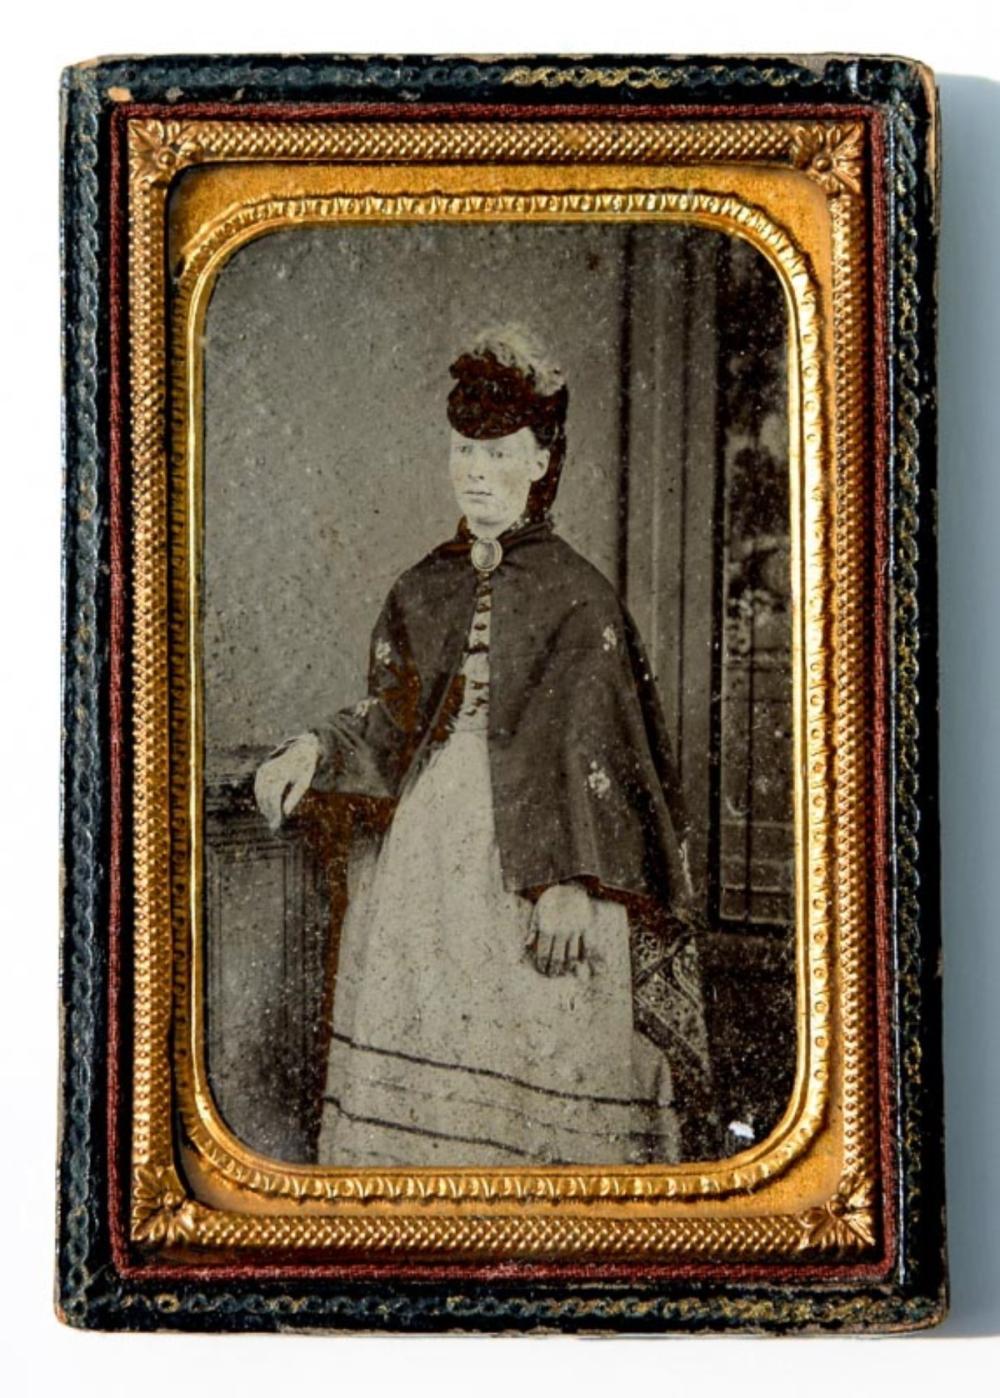 Leather tintype frame, Civil War era, 1860s